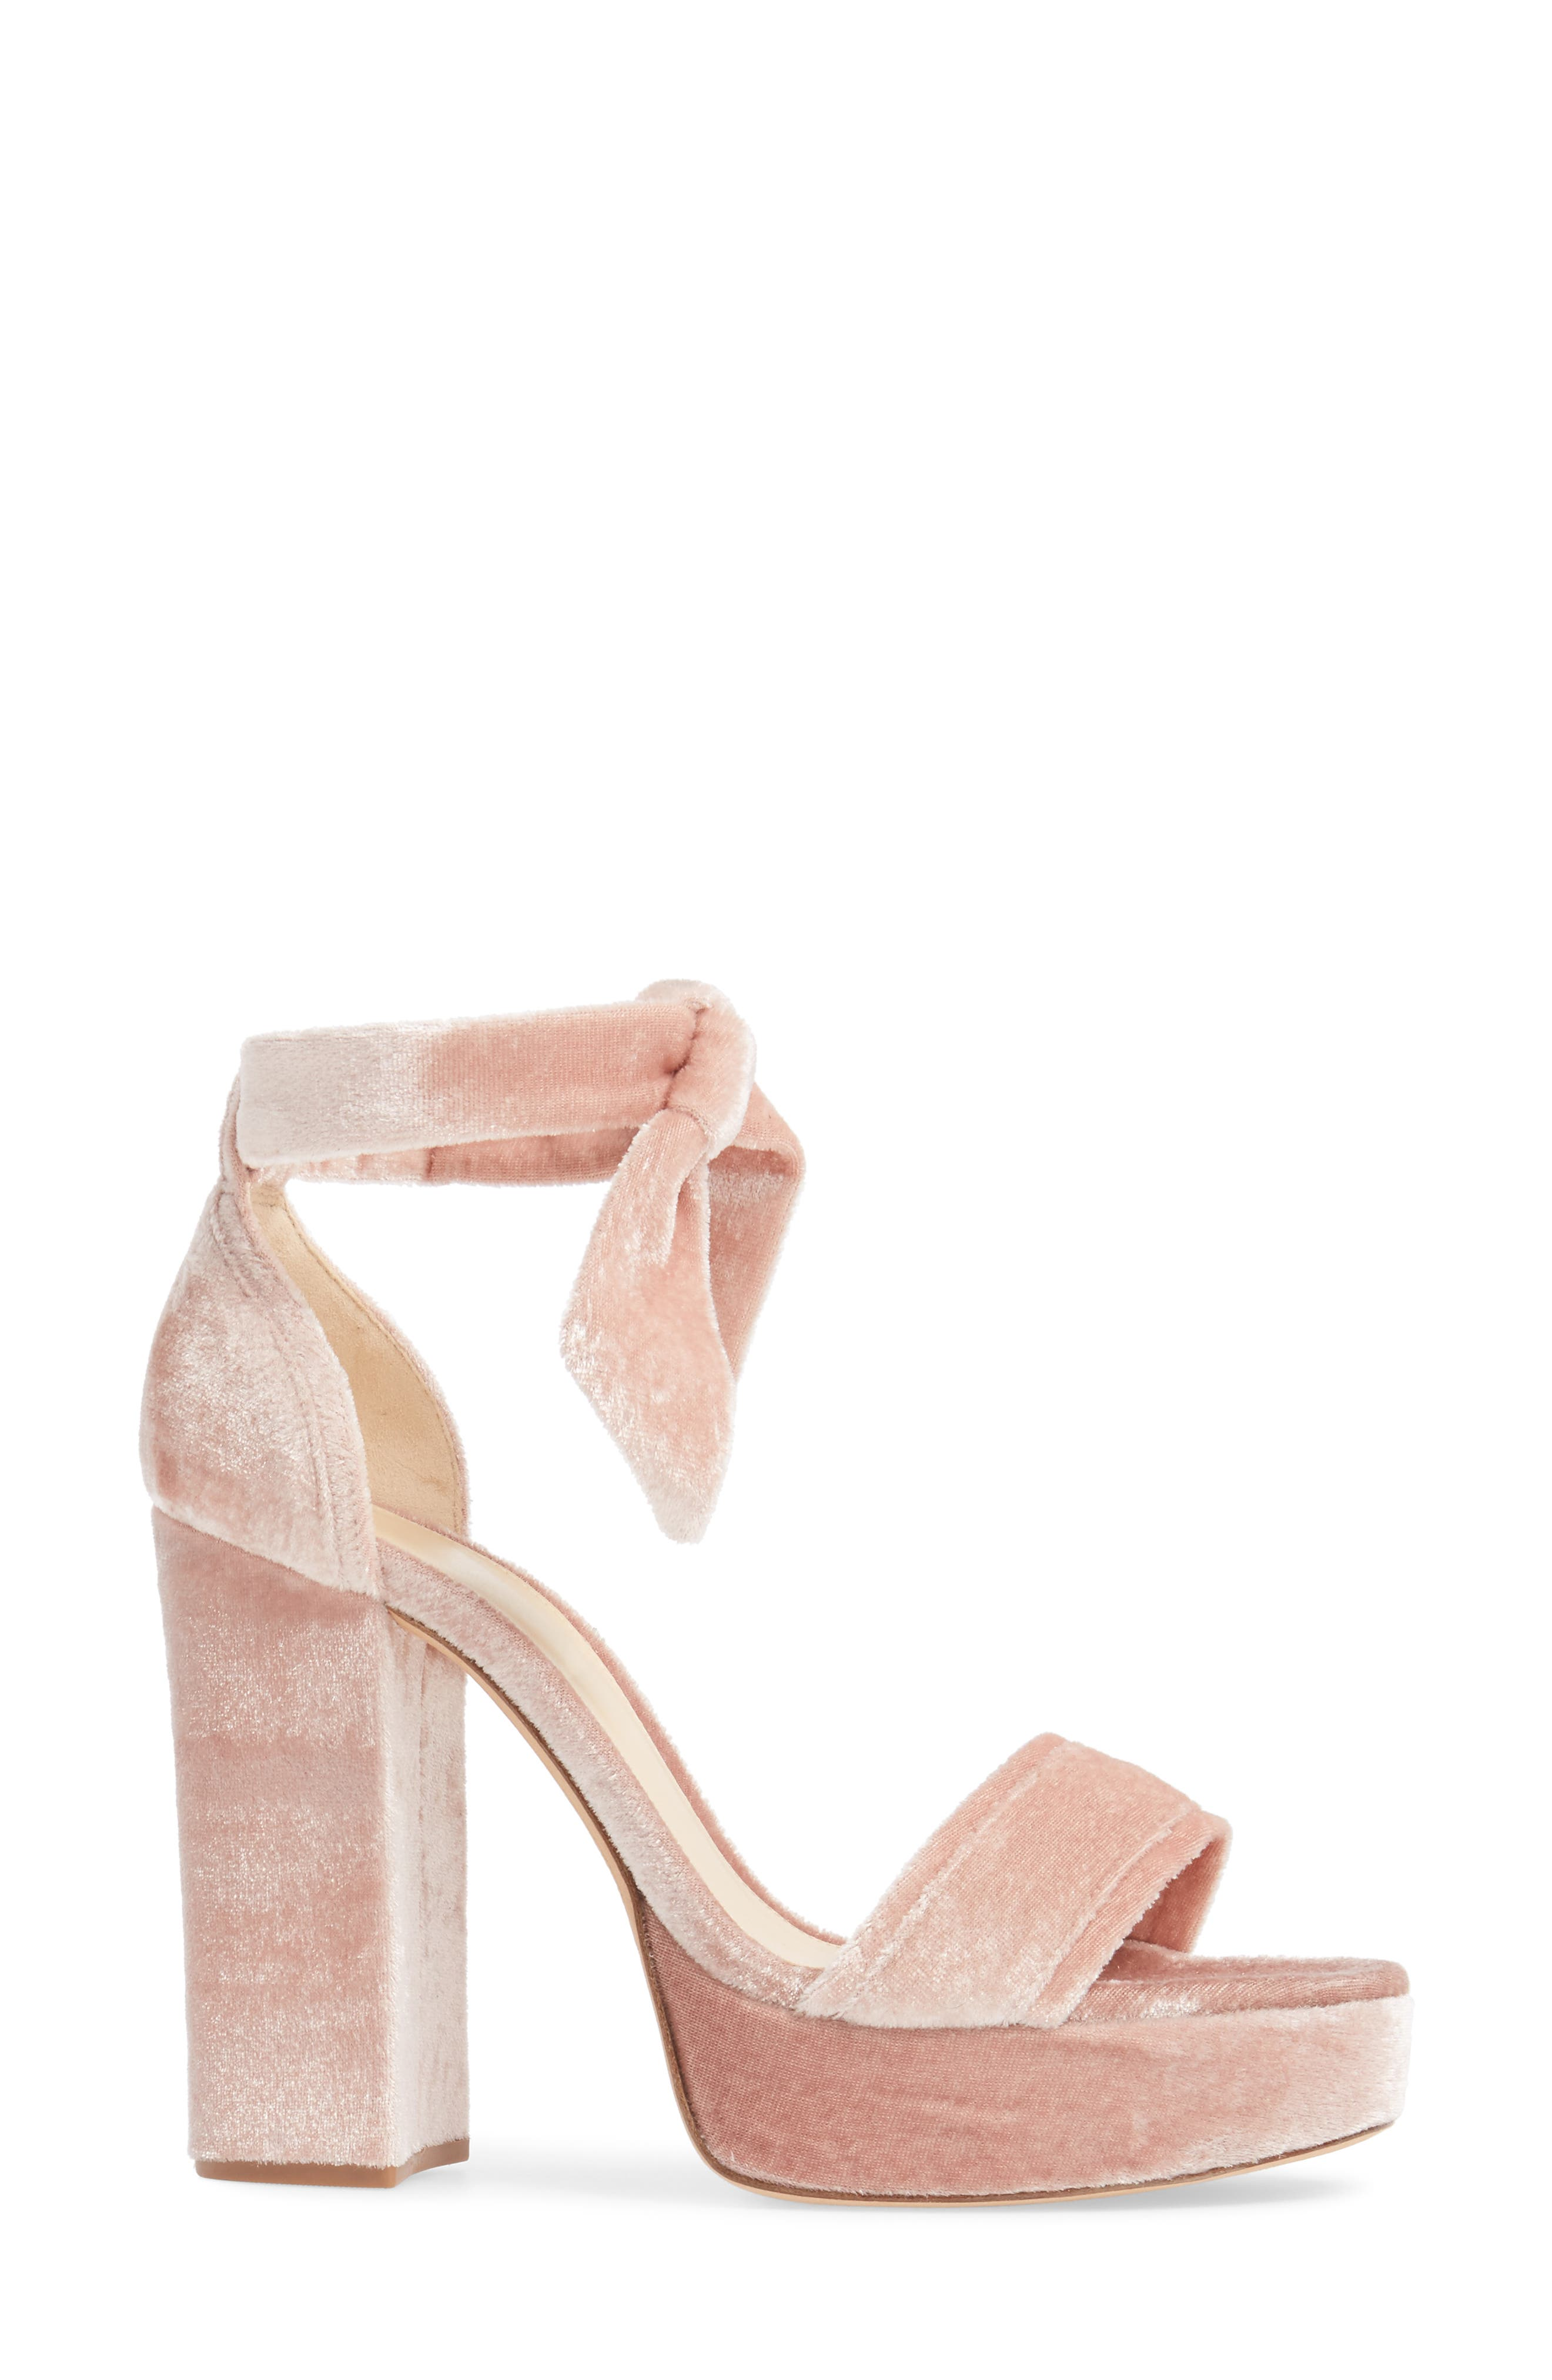 Celine Platform Sandal,                             Alternate thumbnail 3, color,                             Blush